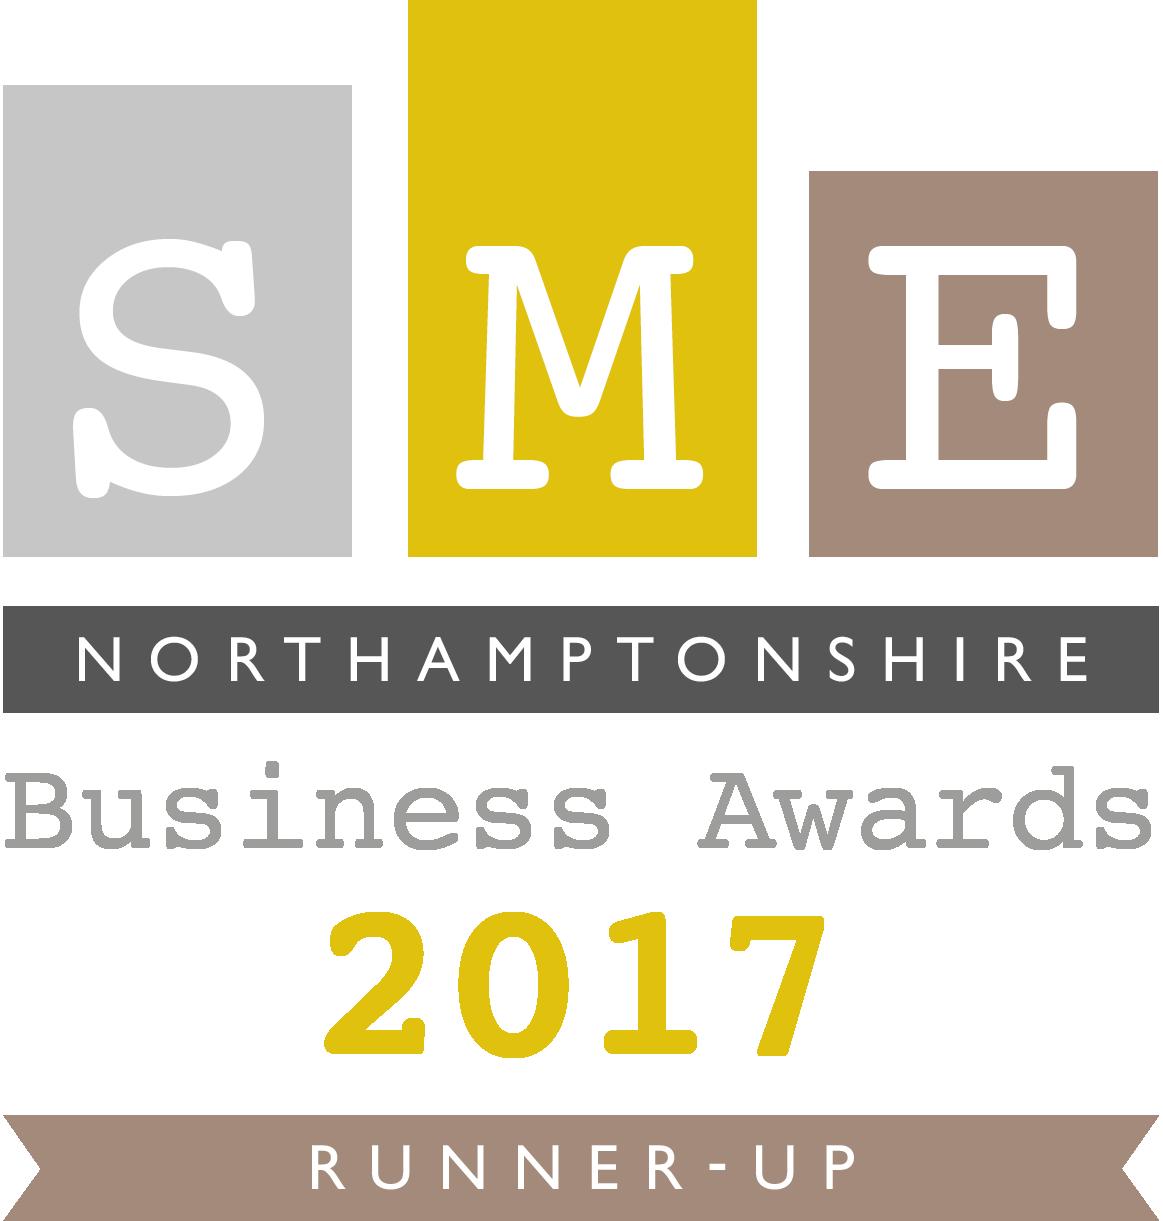 sme-northamptonshire-business-award_runner-up_2017